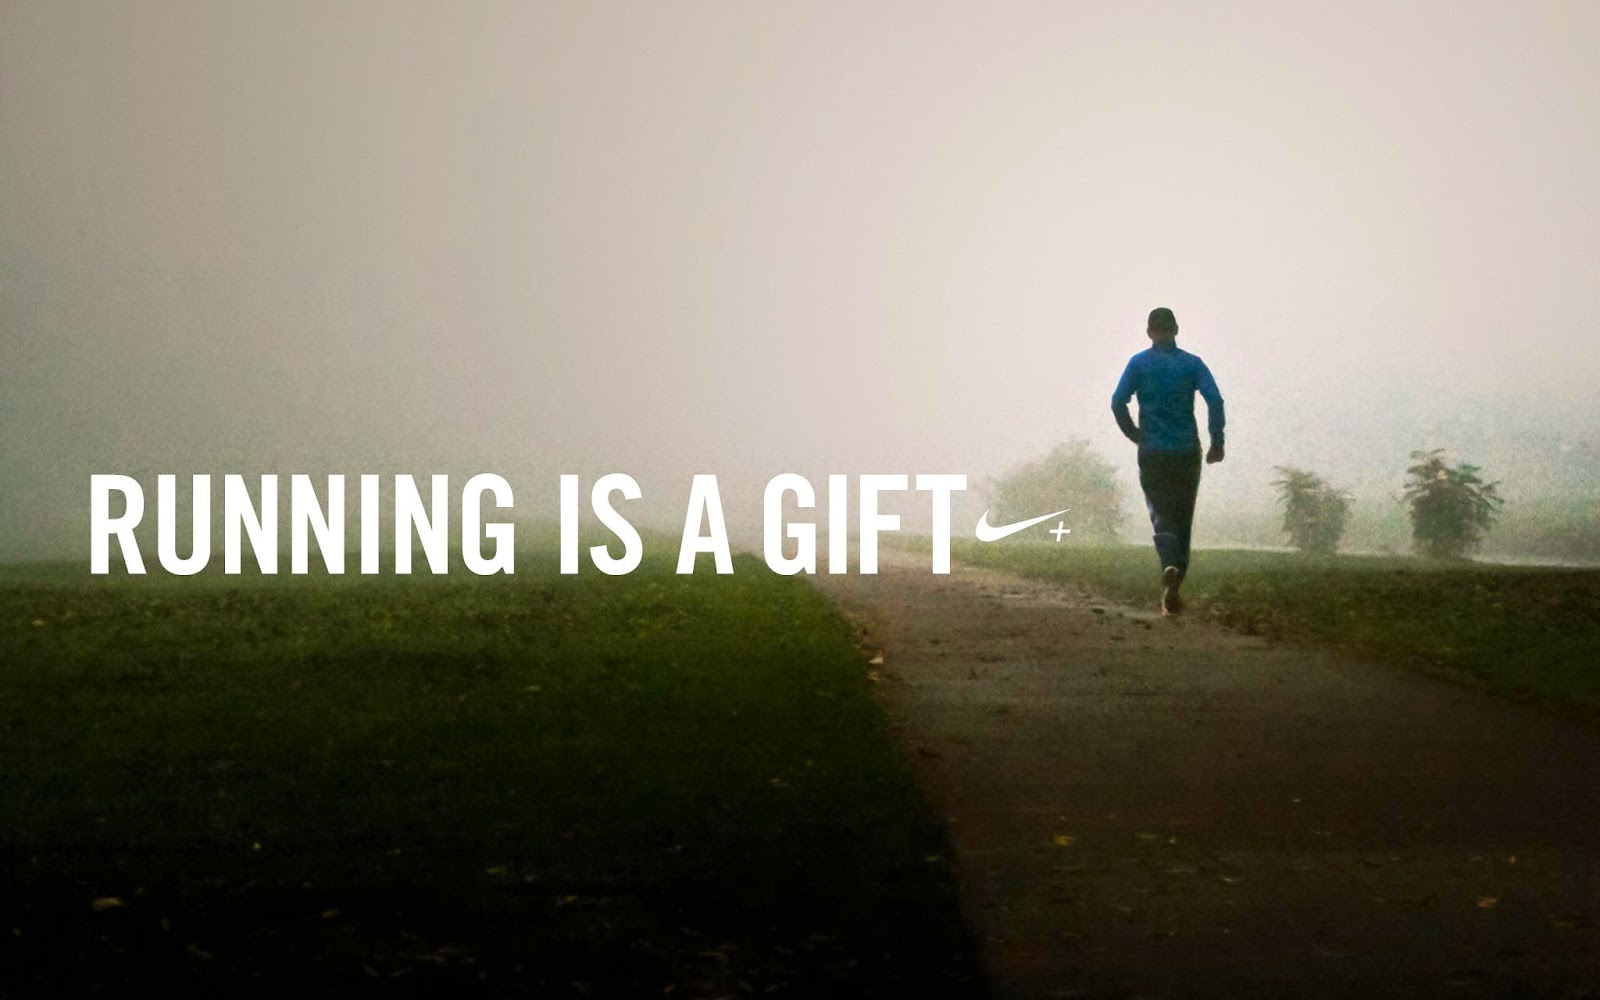 nike running wallpaper quotesnike running quotes health wallpaper 1600x1000